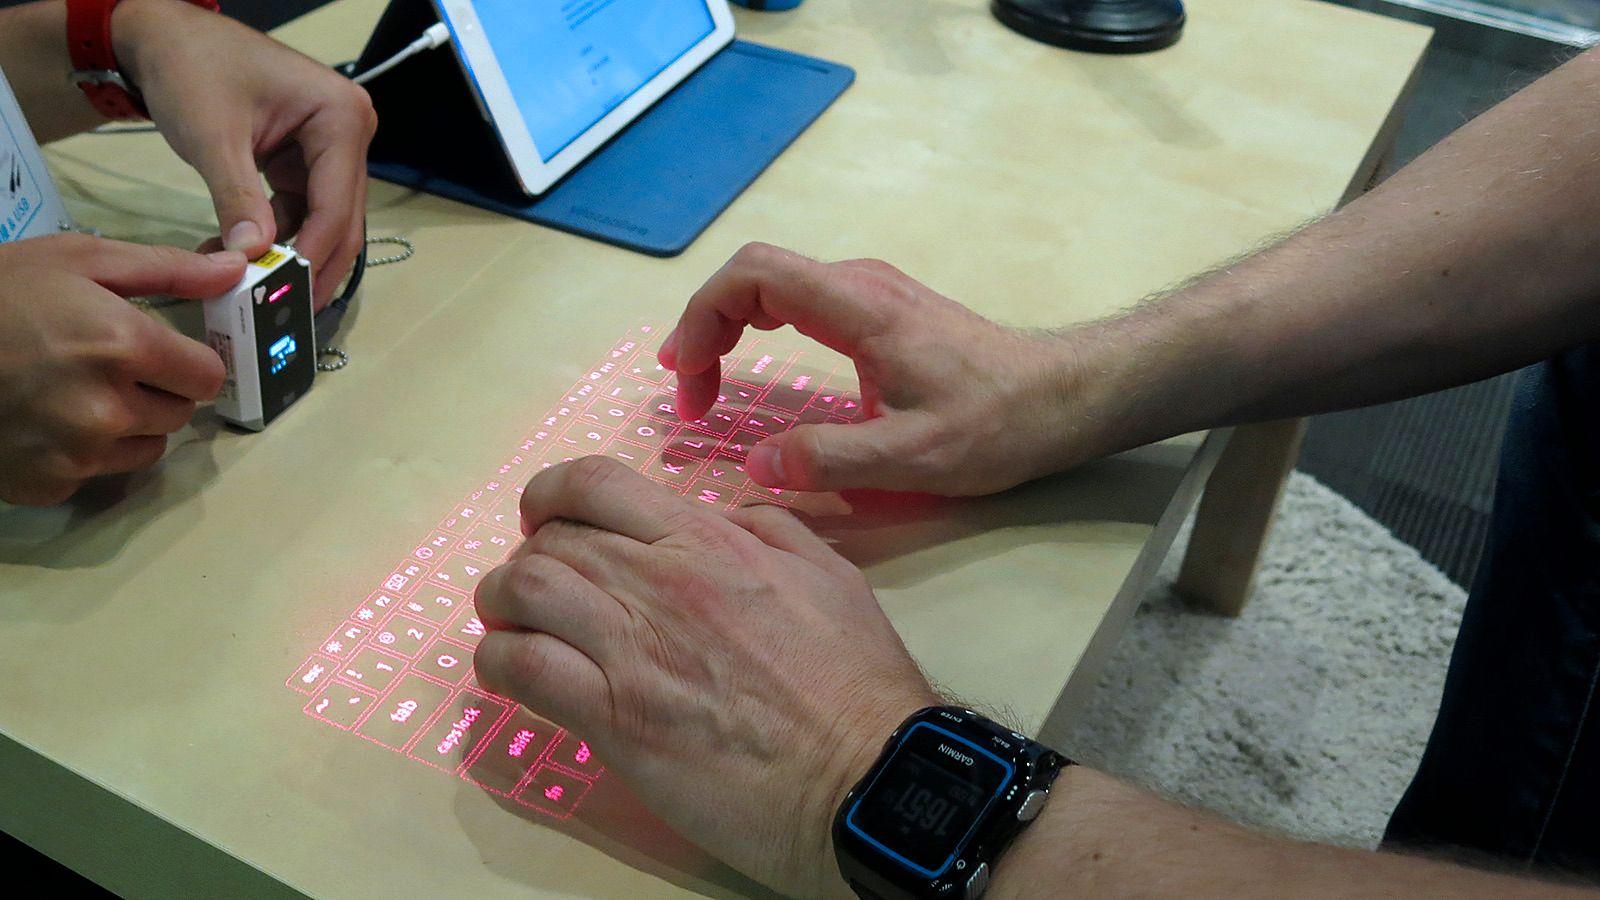 Du kan skrive ganske kjapt på lasertastaturet. Foto: Vegar Jansen, Tek.no